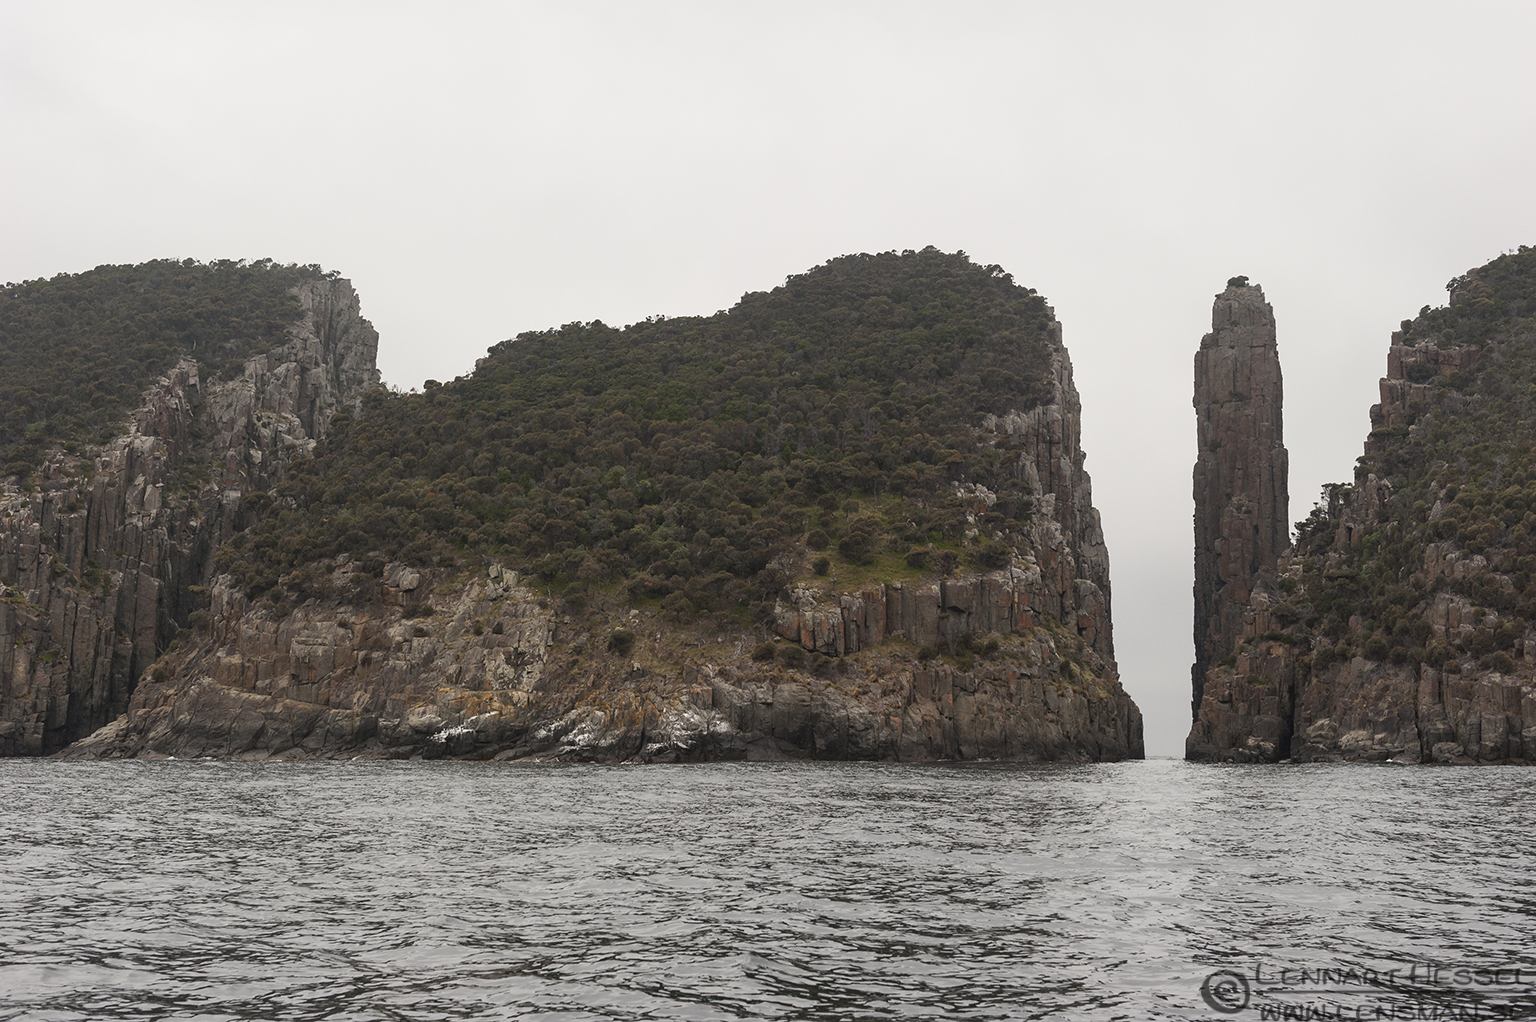 The gate Tasman Peninsula